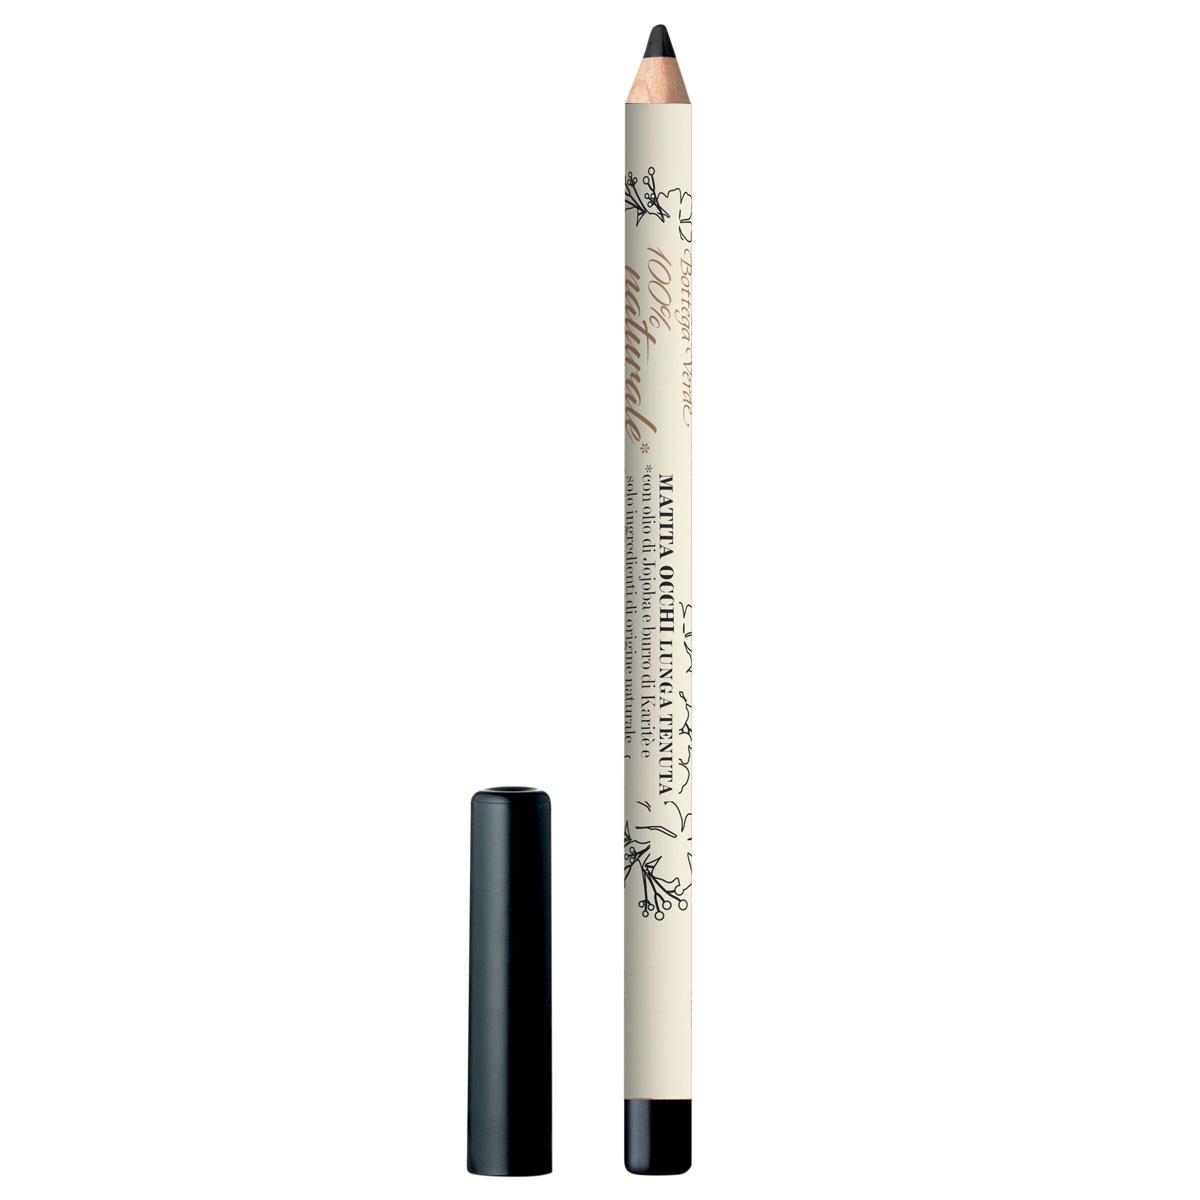 Creion De Ochi De De Lunga Durata Cu Extract De Unt De Shea Si Unt De Jojoba.